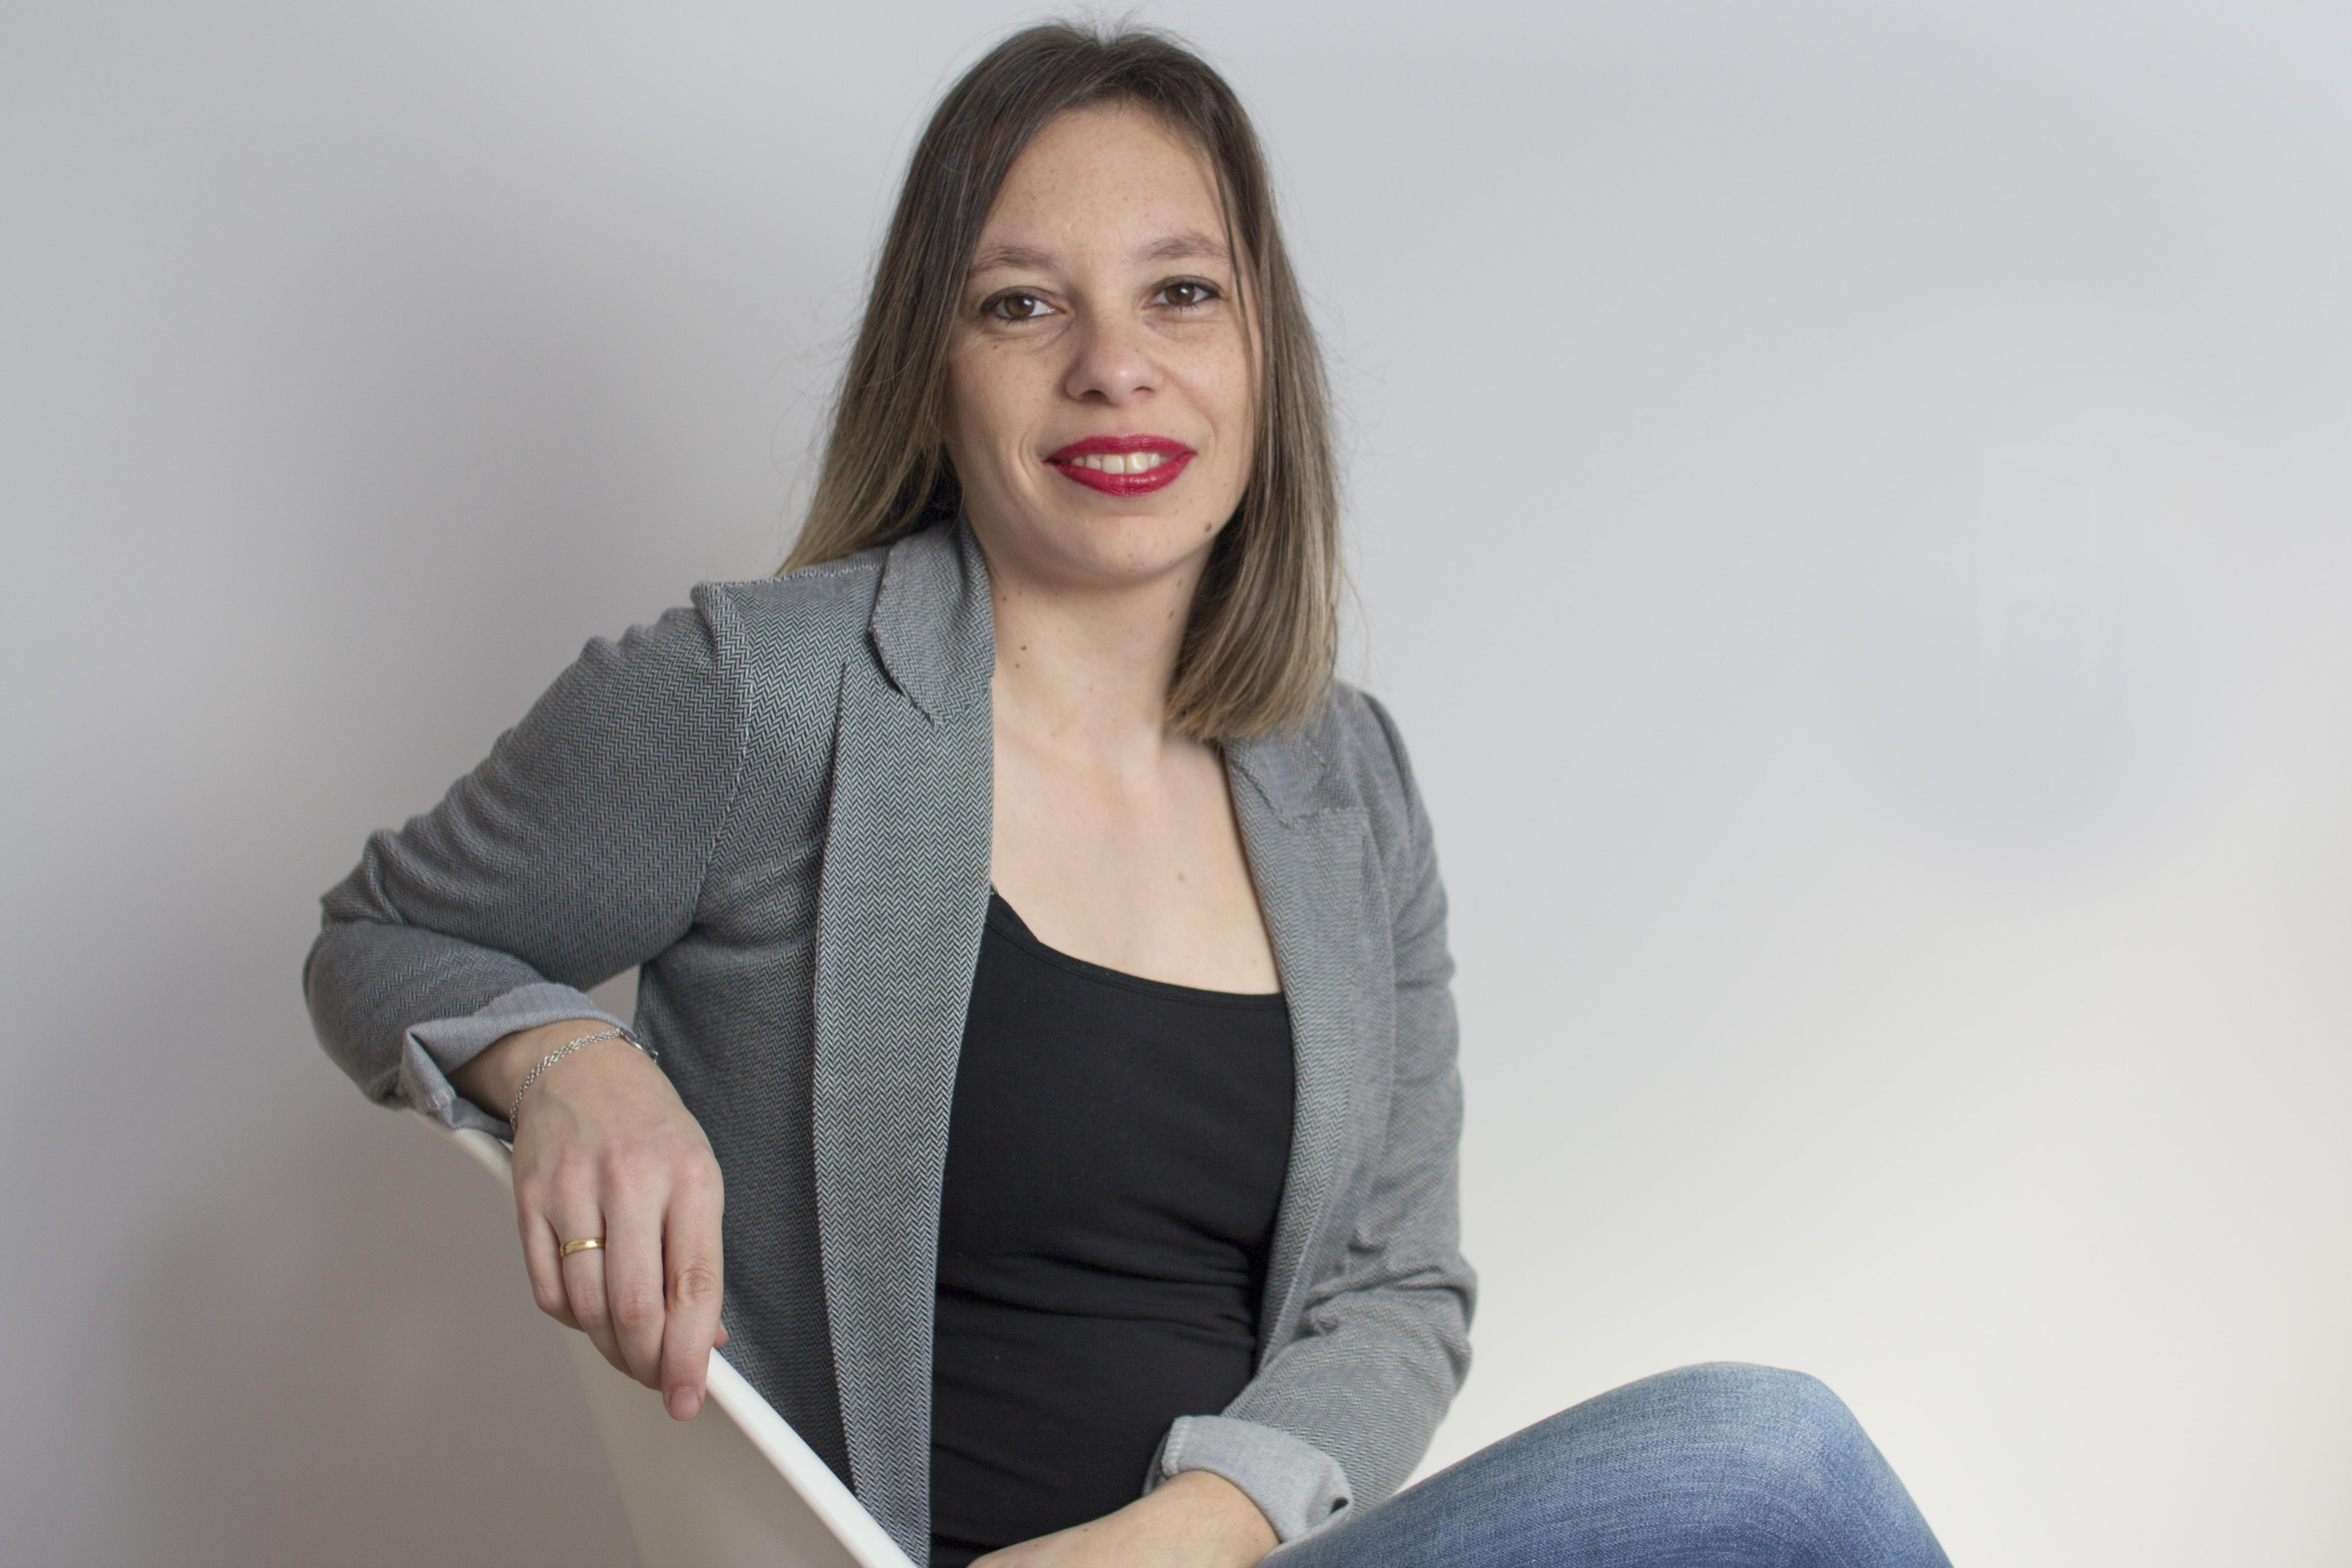 Silvia Rodríguez Blanco